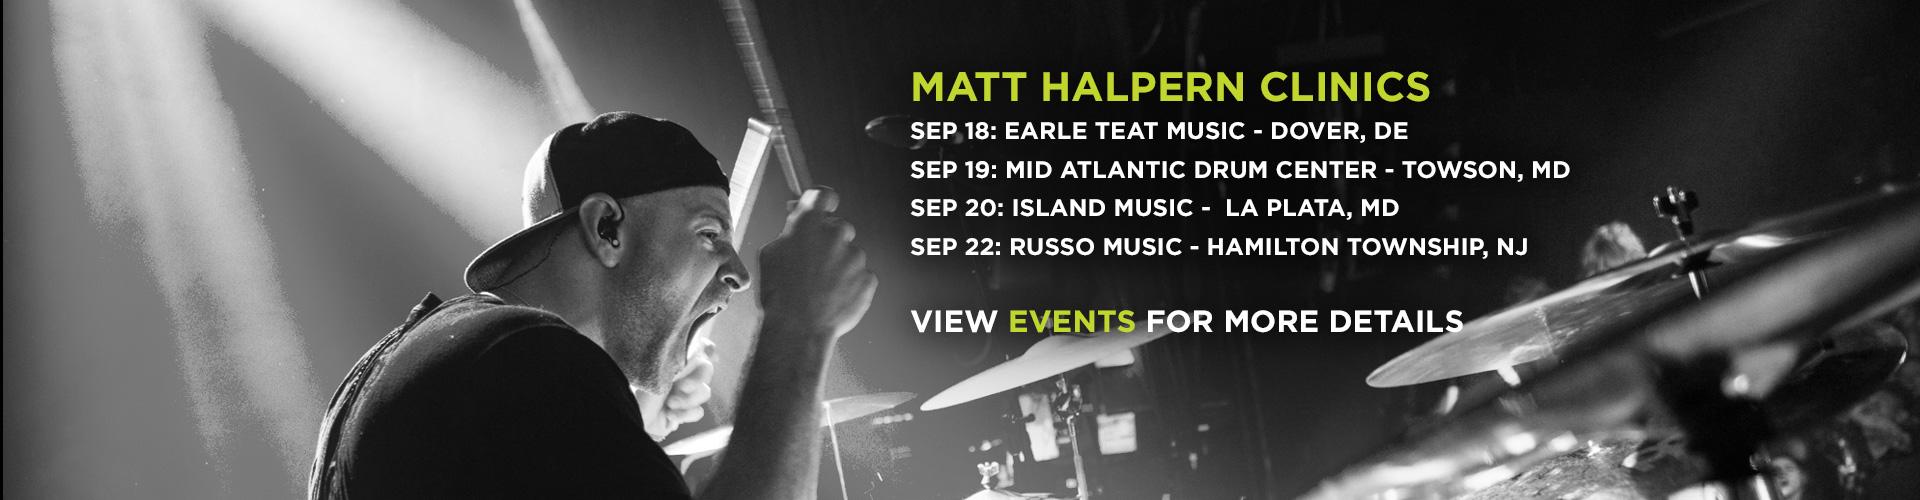 Matt Halpern Clinics 2017